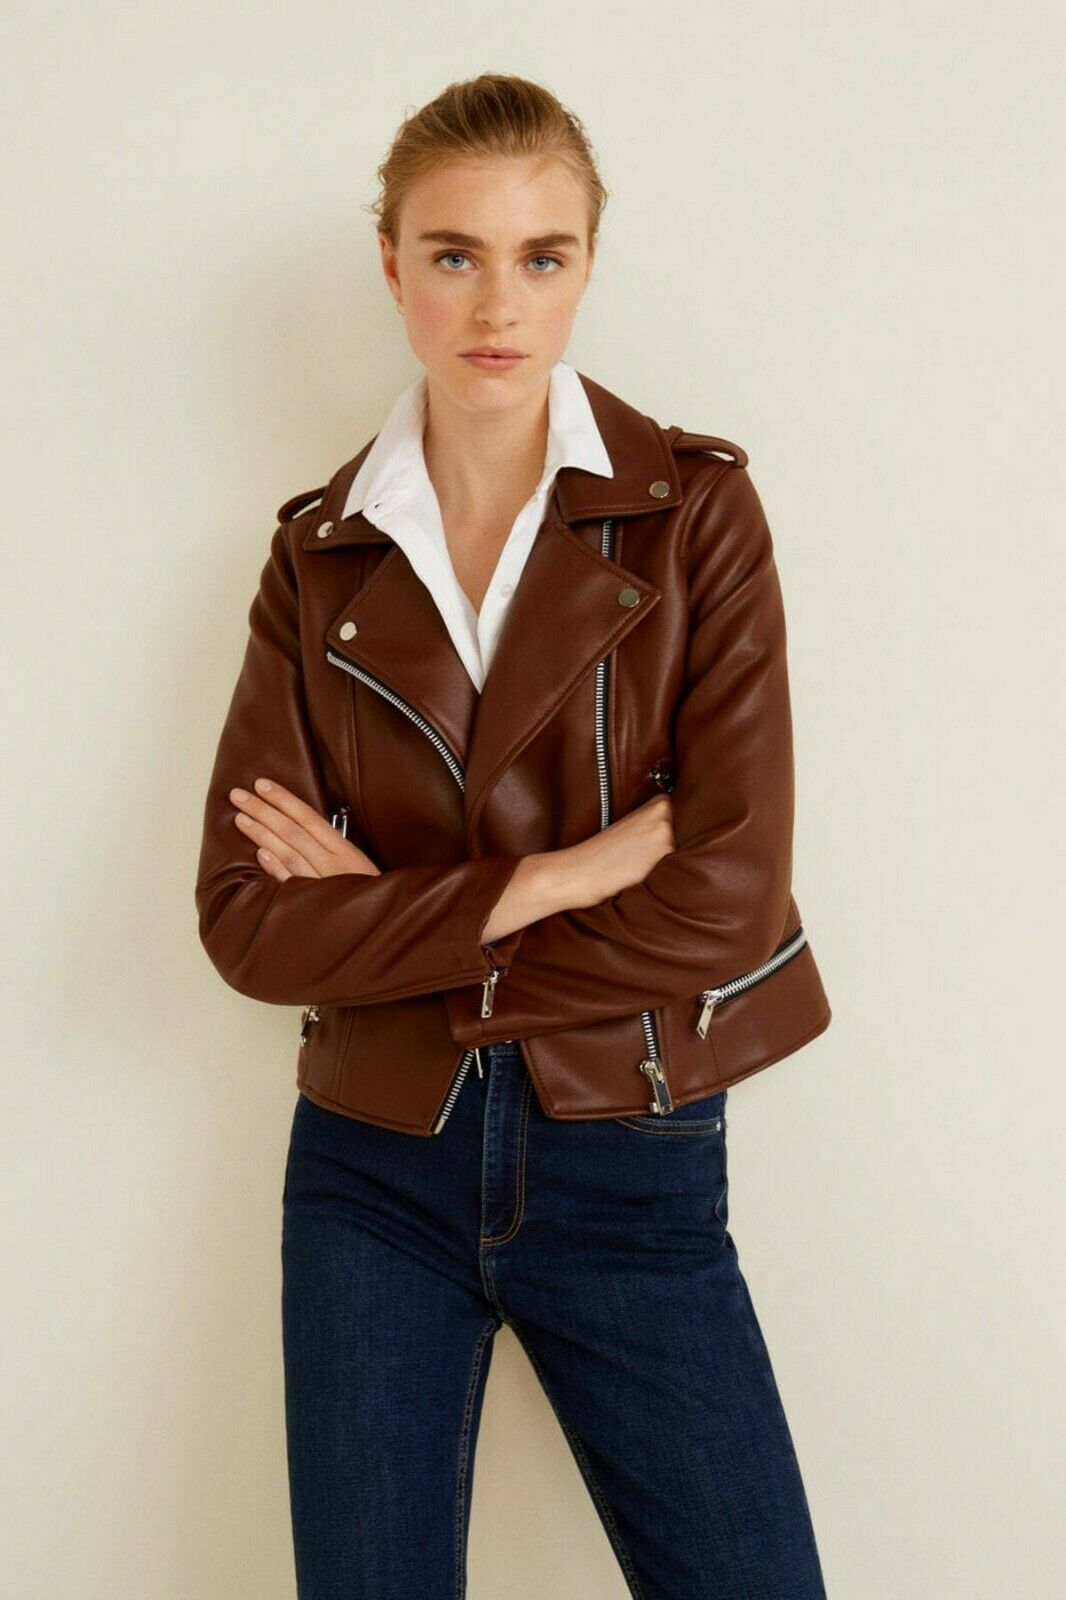 Mango Brown Applique Biker Zip Detail Jacket Uk Size Small Vr219 02 For Sale Online Ebay